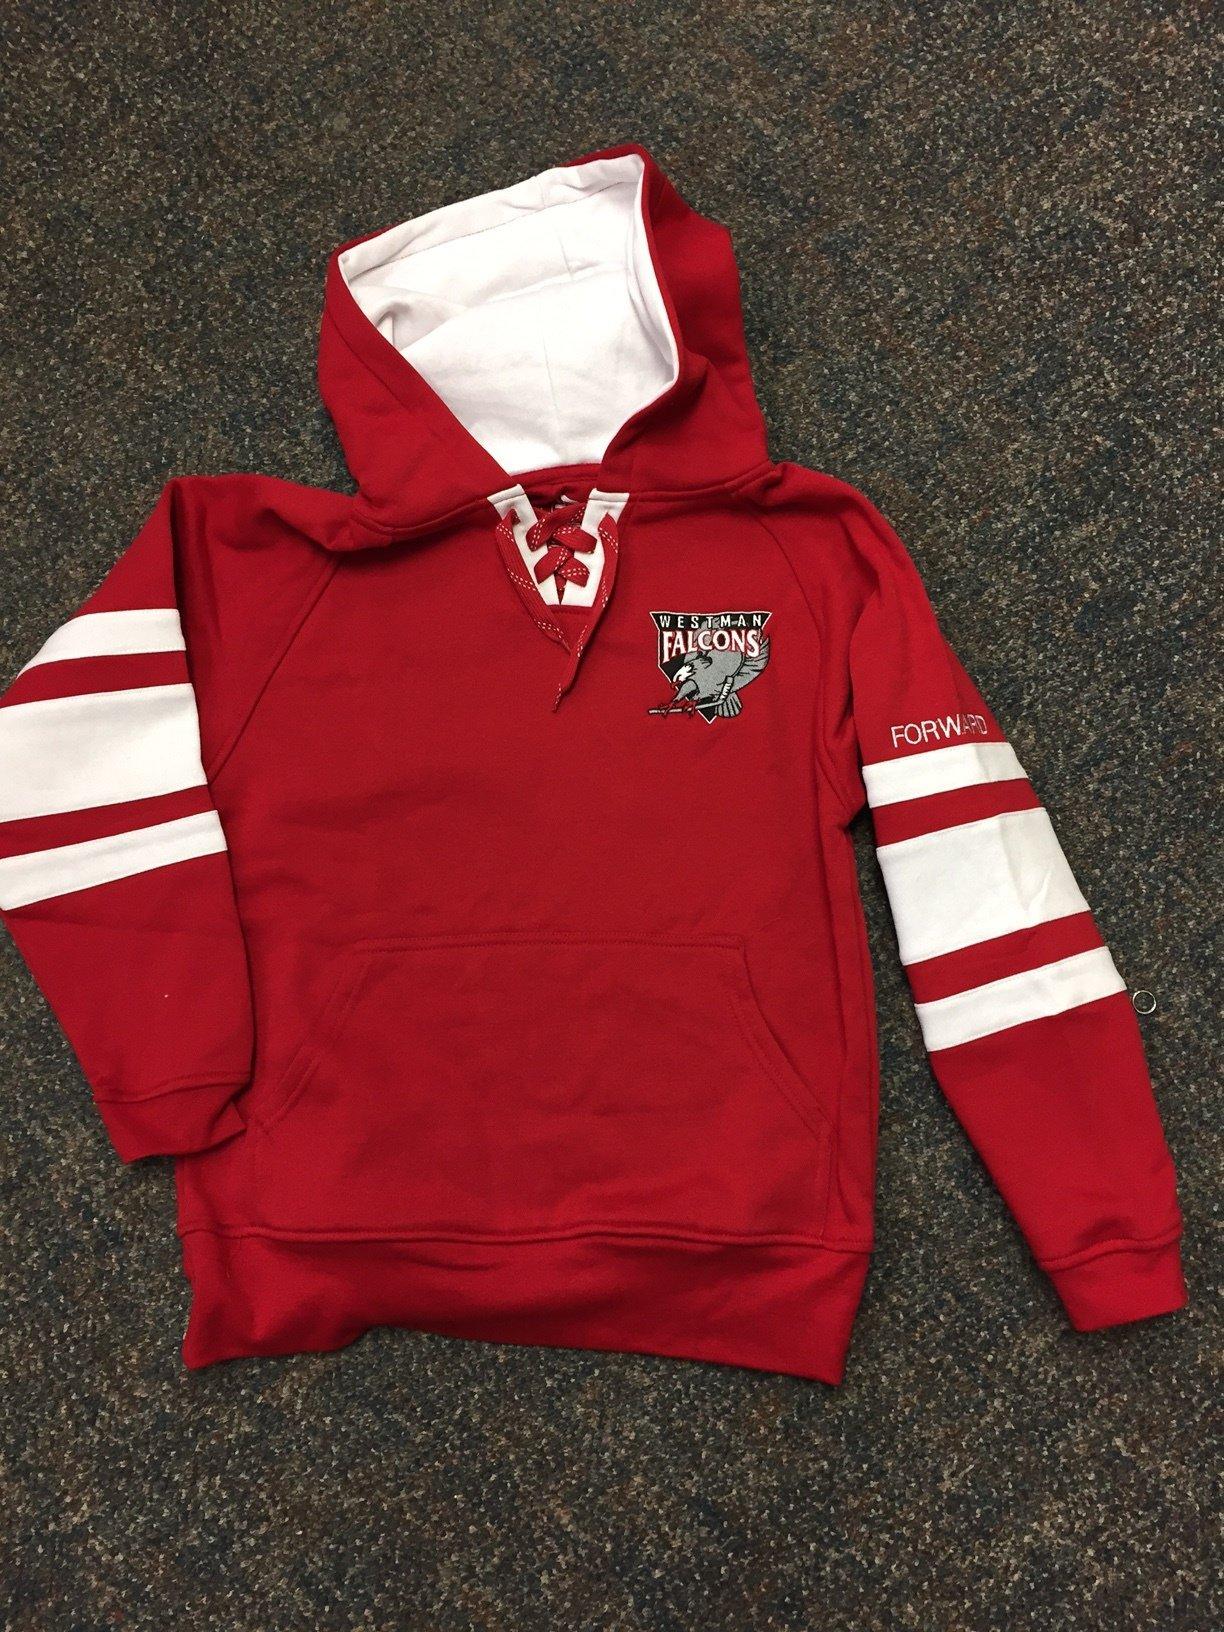 https://0901.nccdn.net/4_2/000/000/03f/ac7/Westman-Falcons-FRONT-skate-lace-hoodie-Jan-2018-1224x1632.jpg